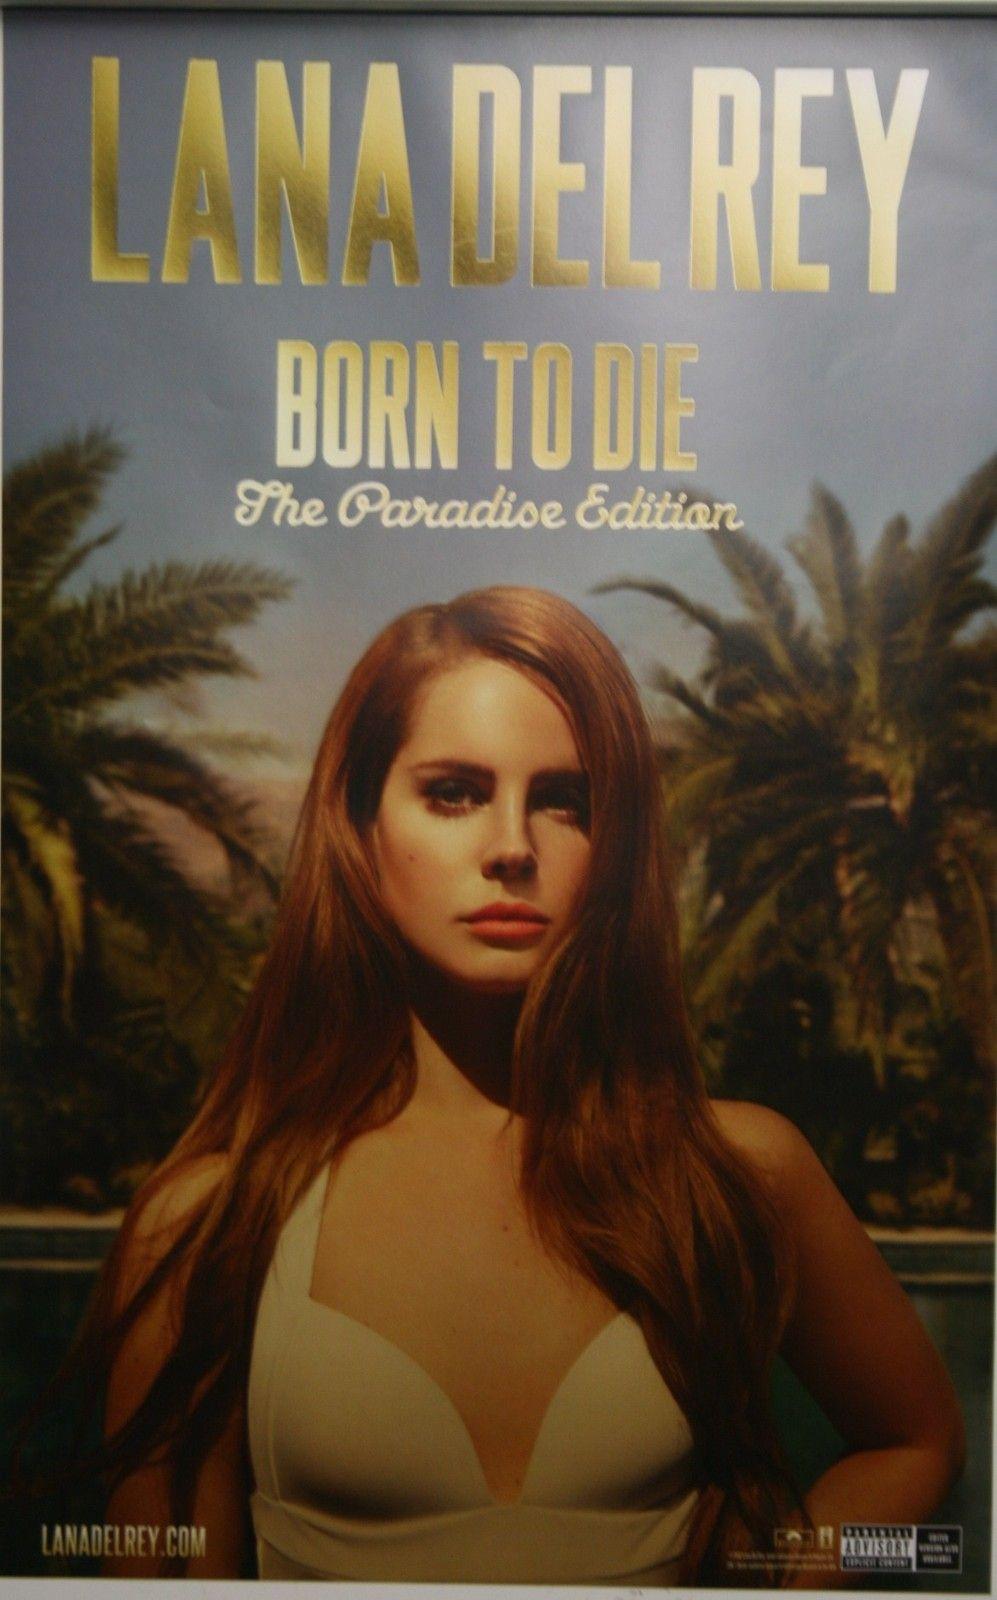 Lana Del Rey Poster Lana Del Rey Lana Del Rey Paradise Lana Del